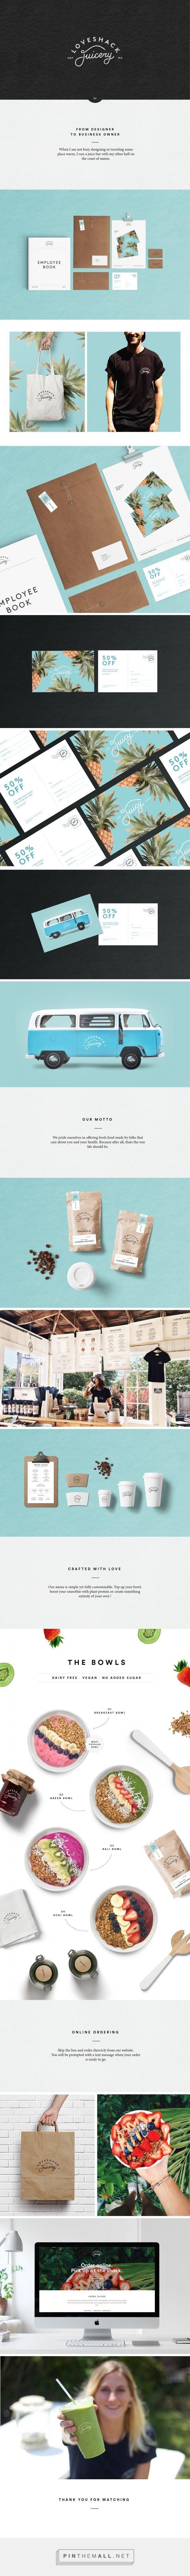 Loveshack Juicery Branding by Cecile Godin | Fivestar Branding Agency – Design and Branding Agency & Curated Inspiration Gallery